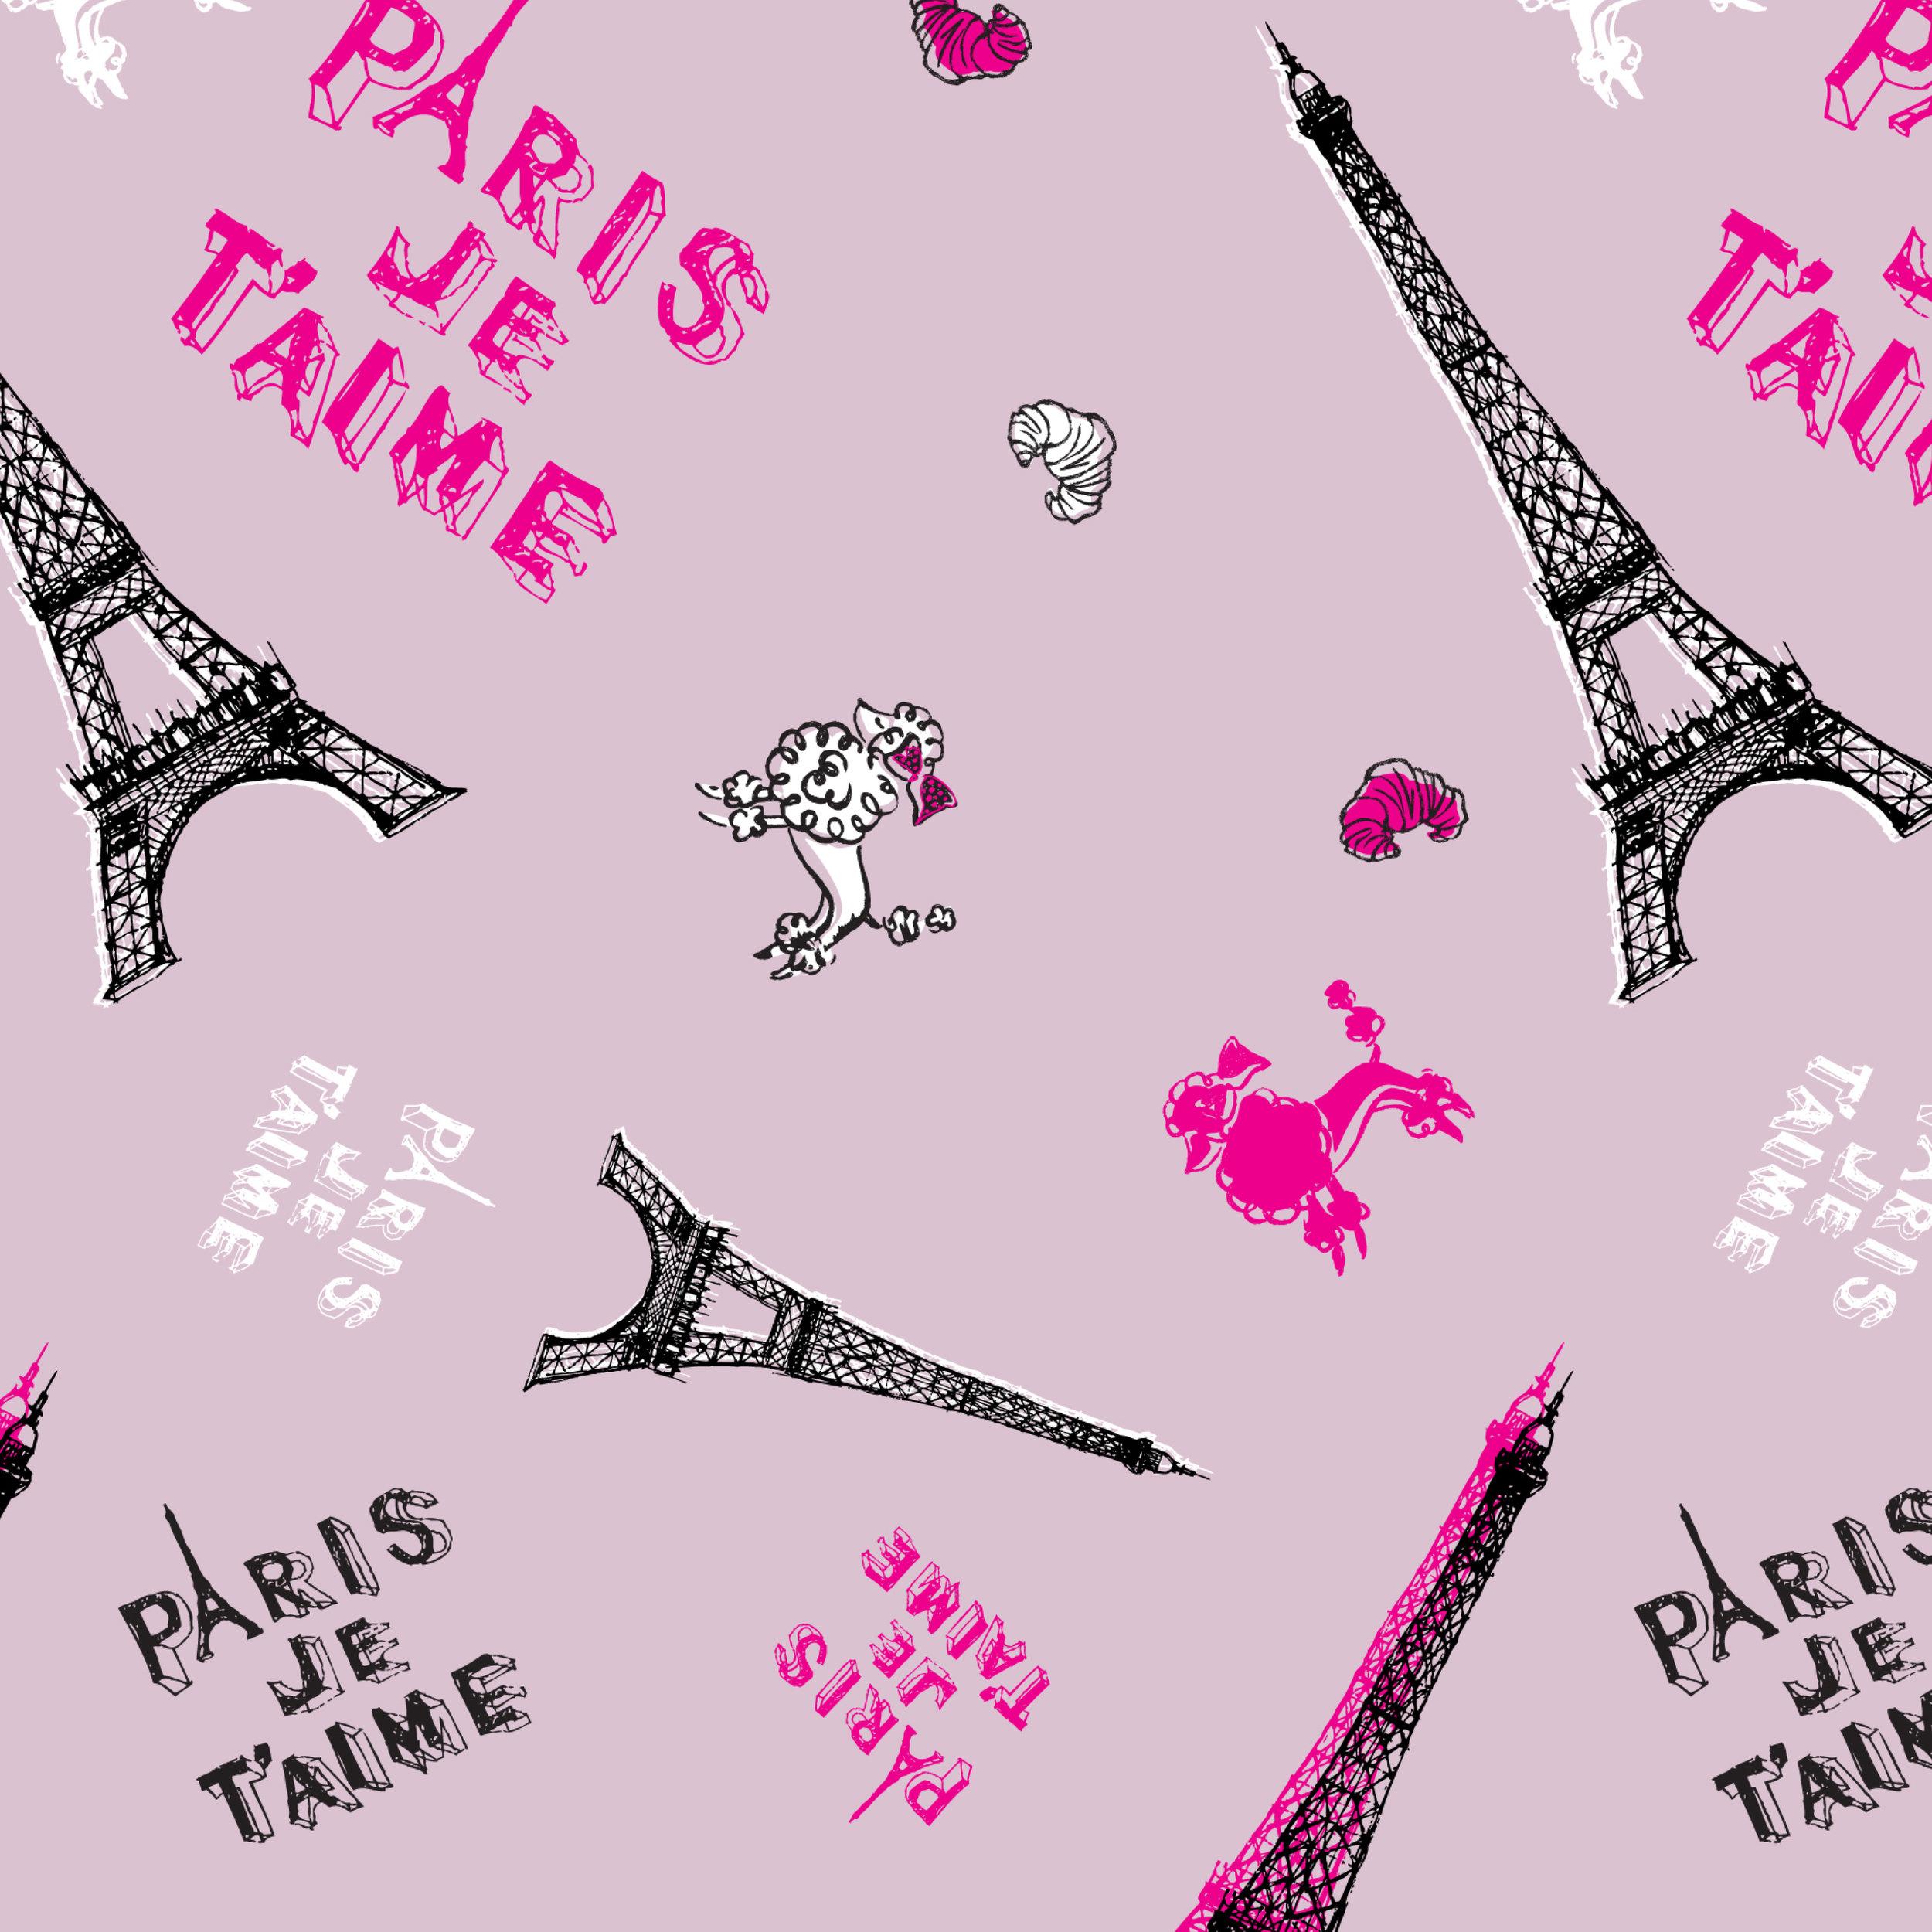 PARIS WITH LOVE.jpg